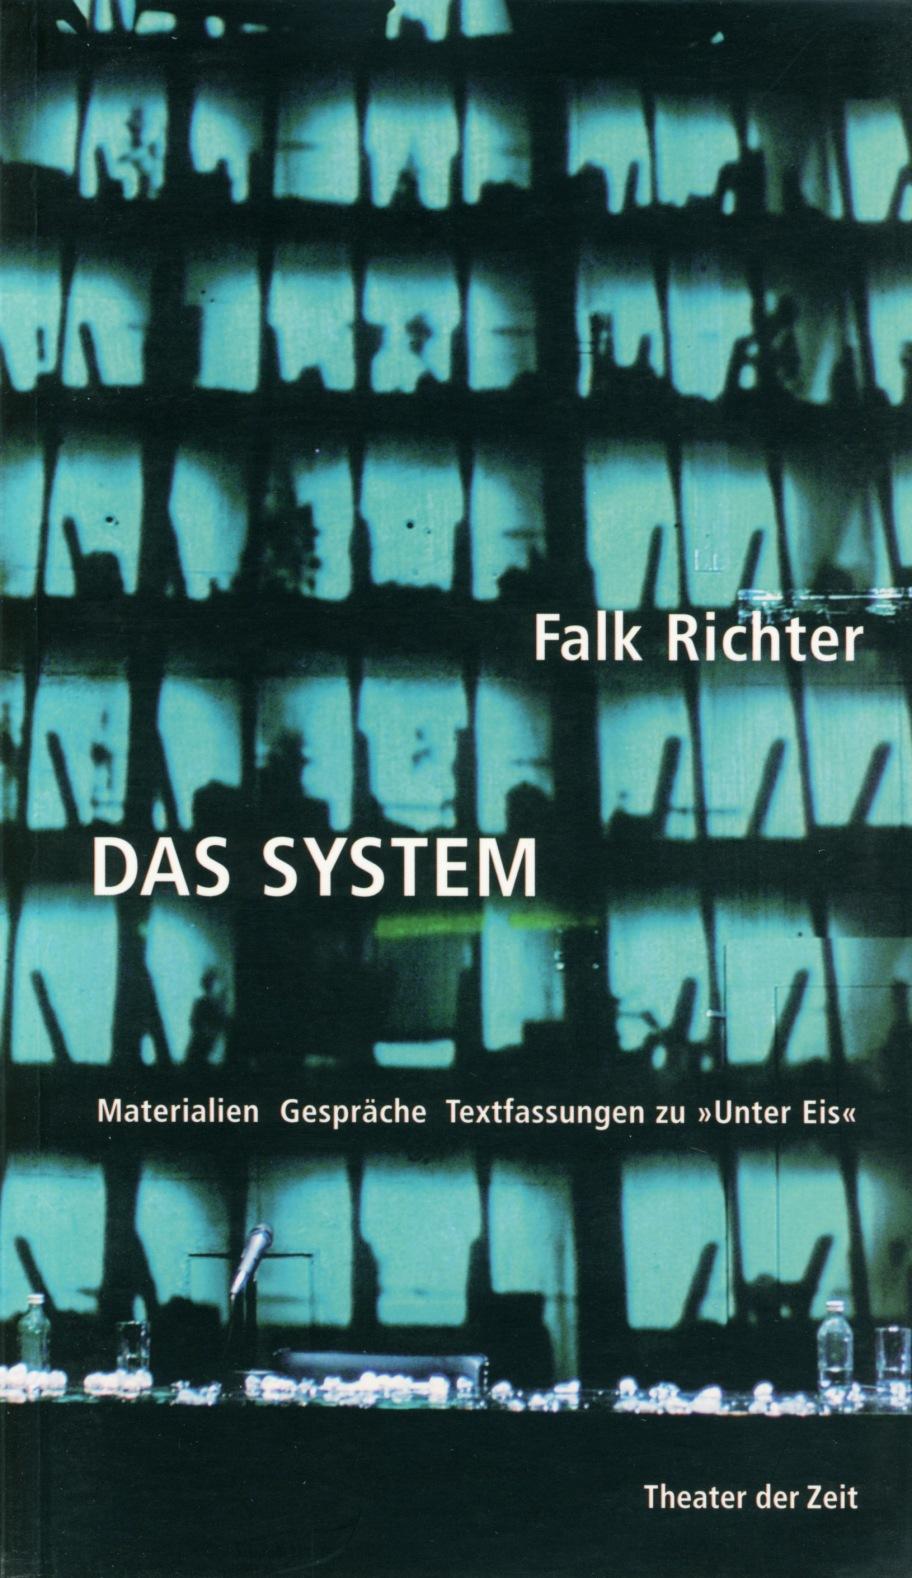 Falk Richter: Das System